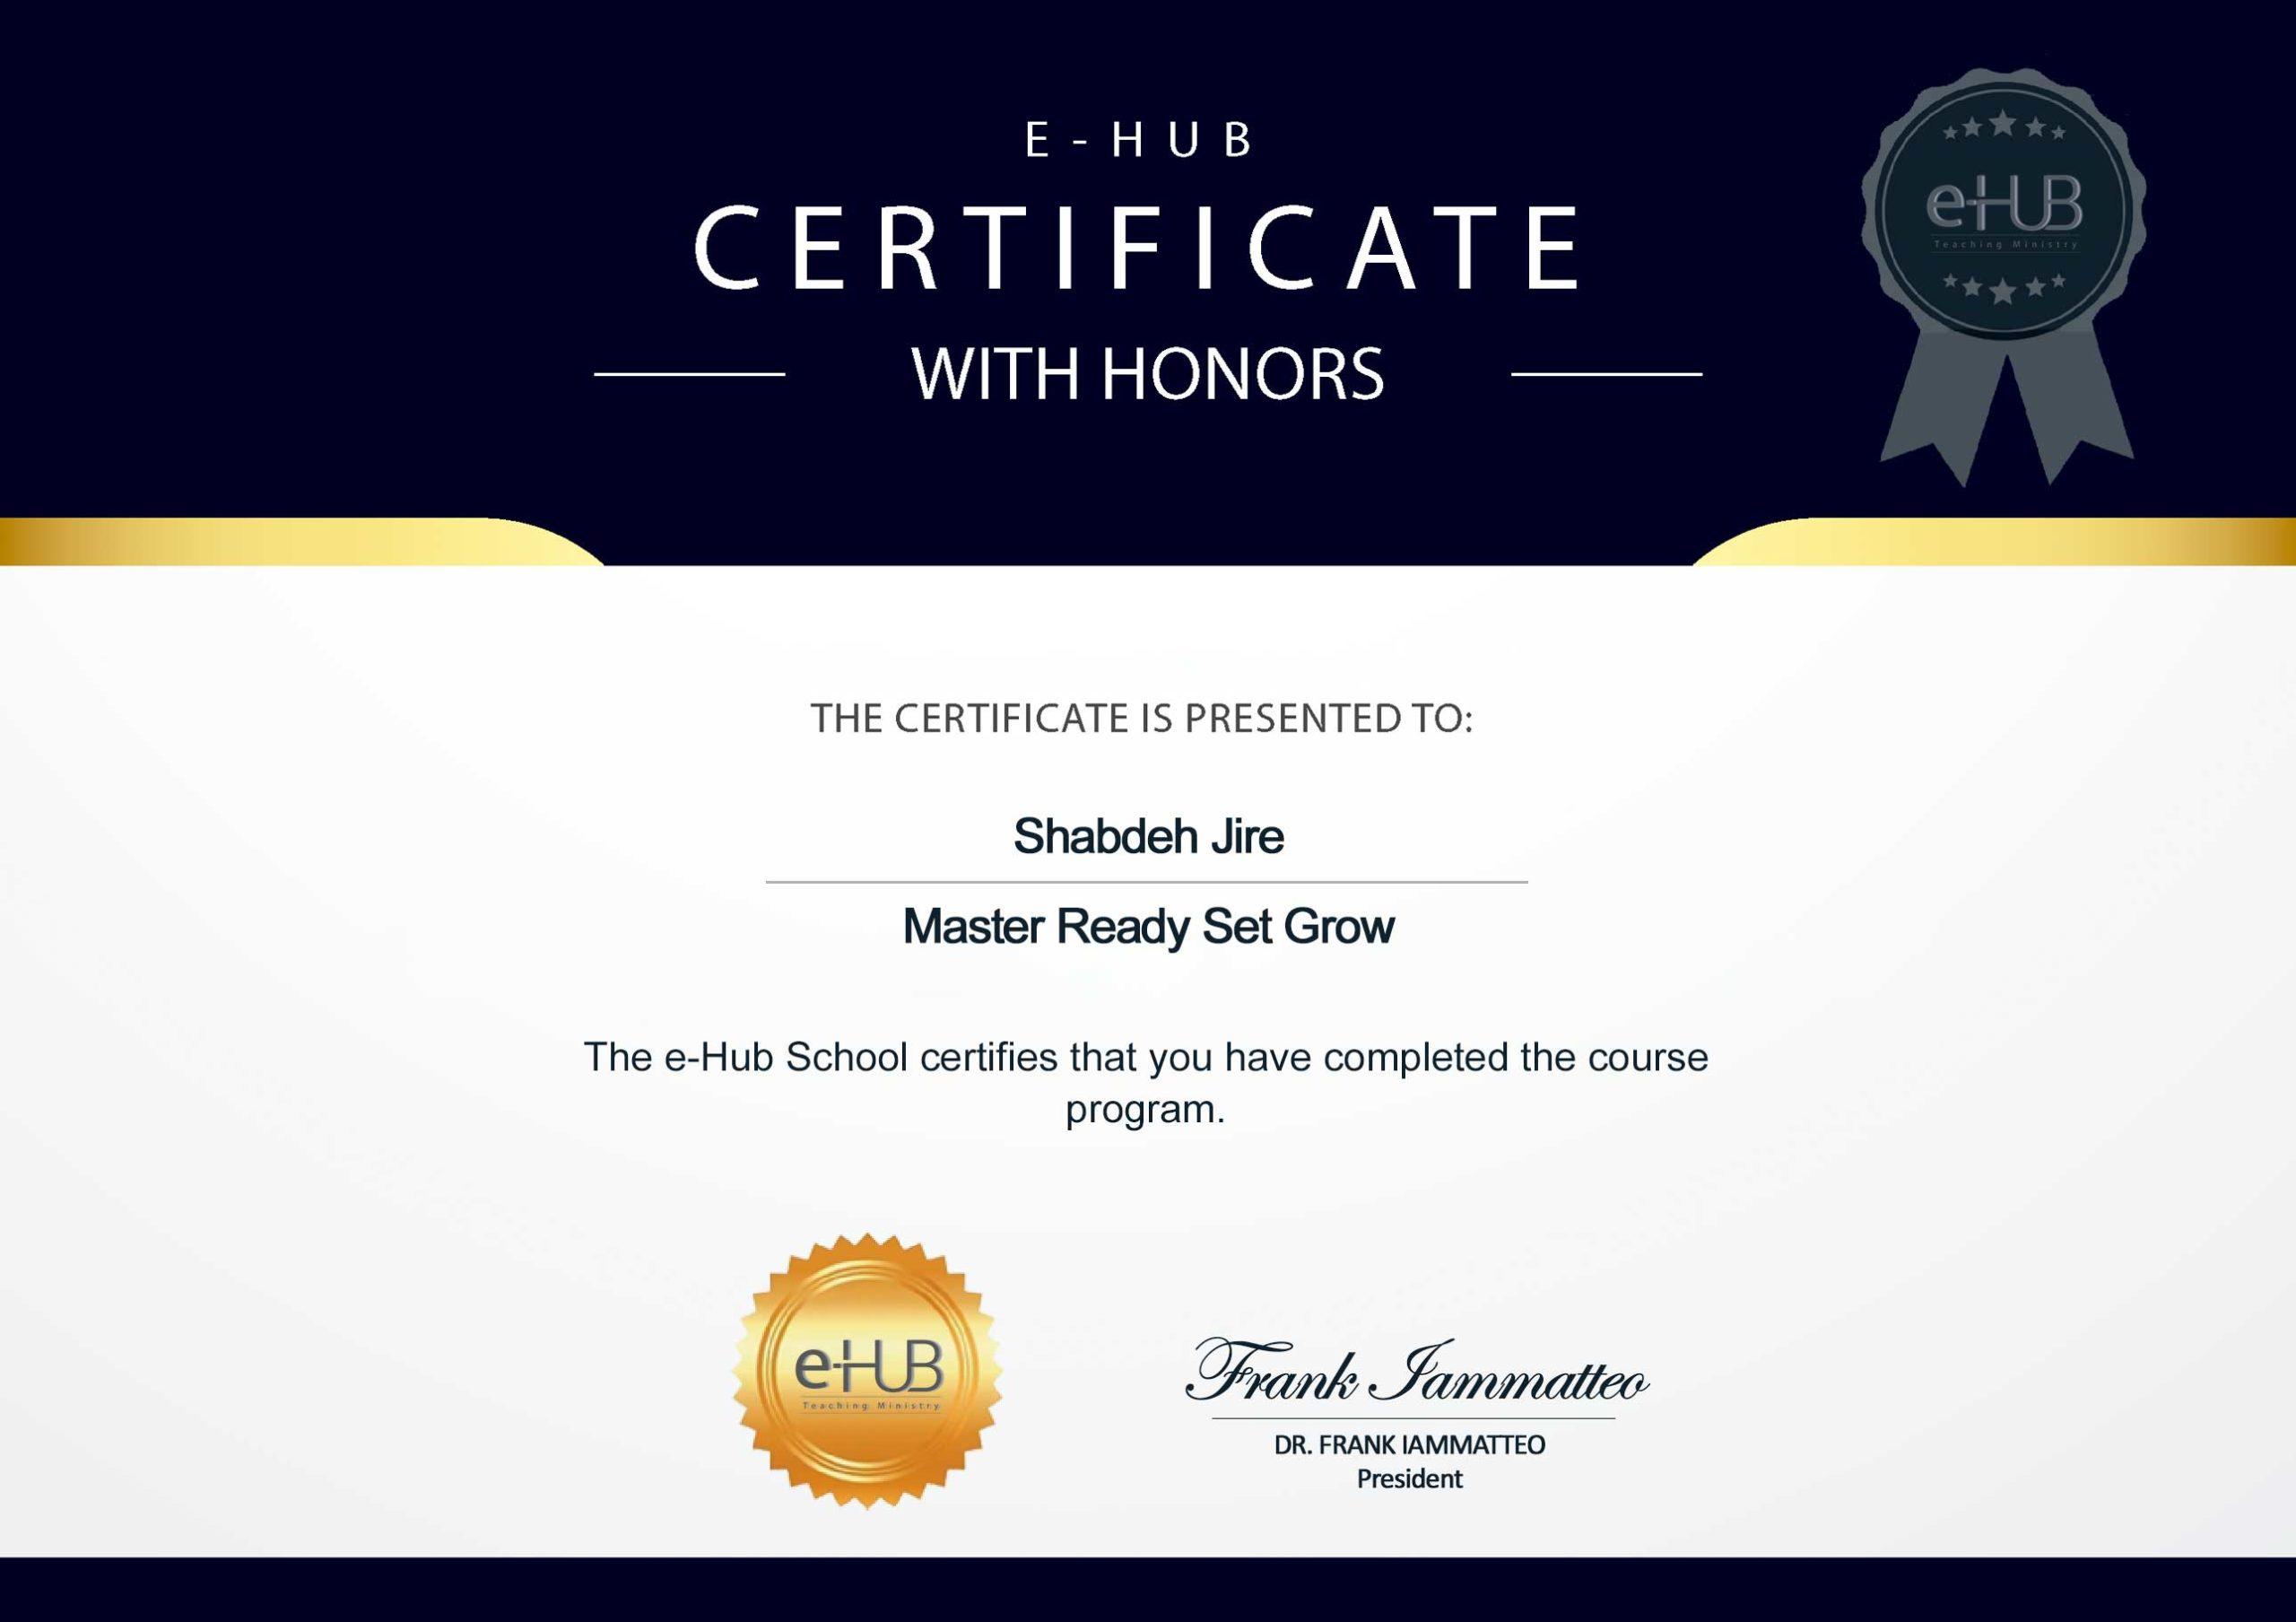 Certificate E-Hub (Dr. Frank Iammatteo)